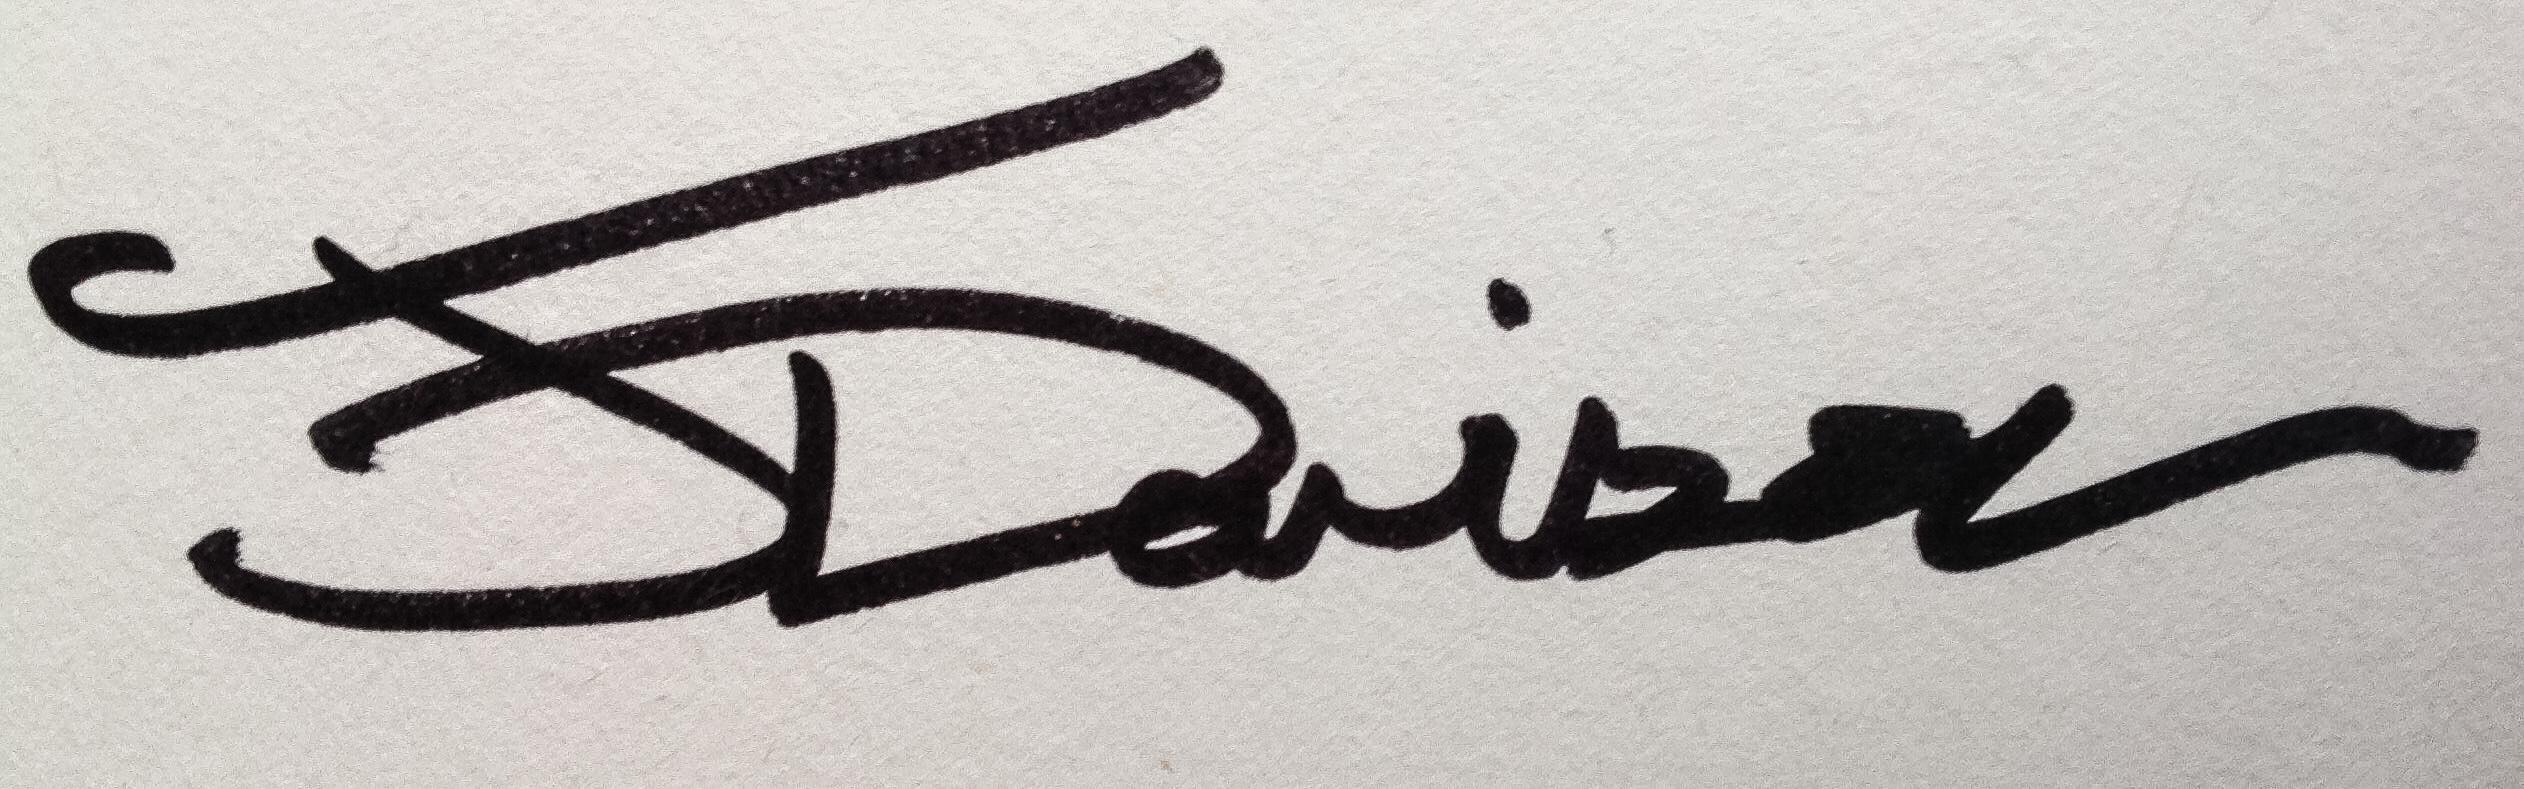 John Davison's Signature